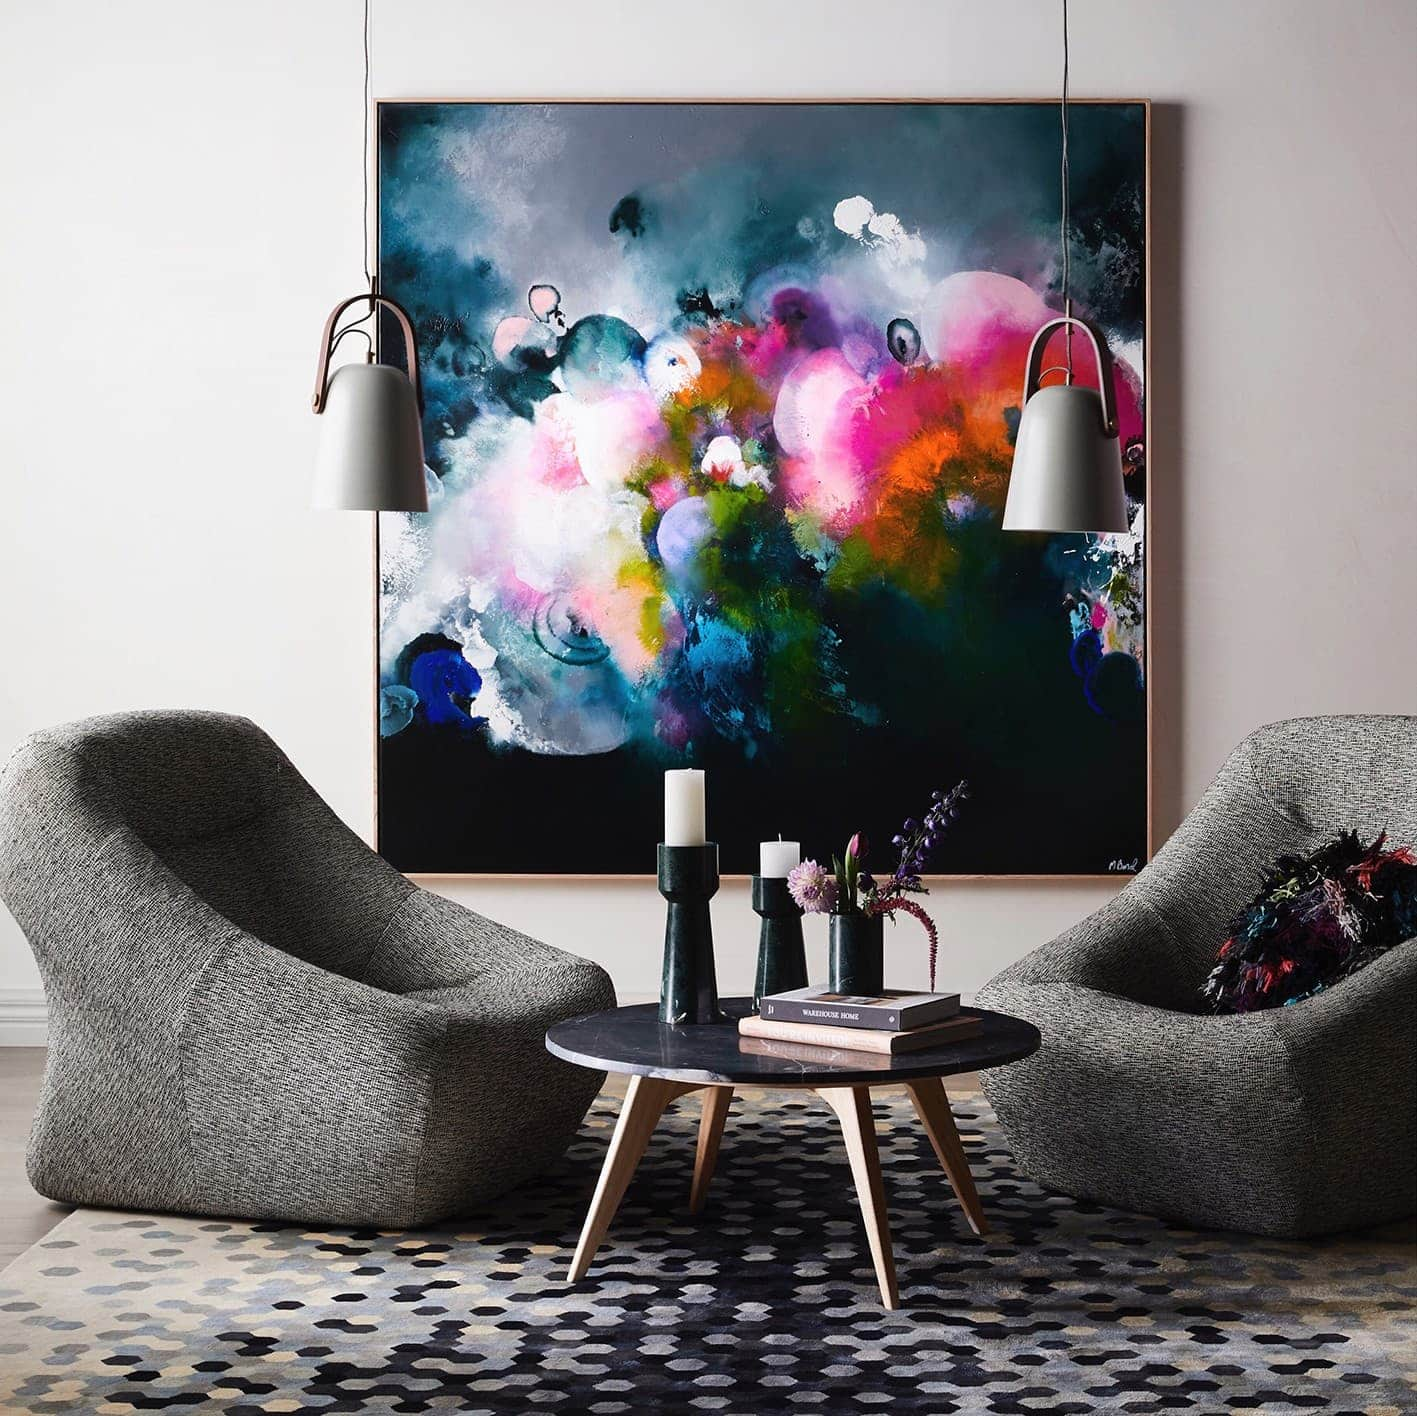 australian abstract artists michael bond colourful artwork on wall grey armchairs